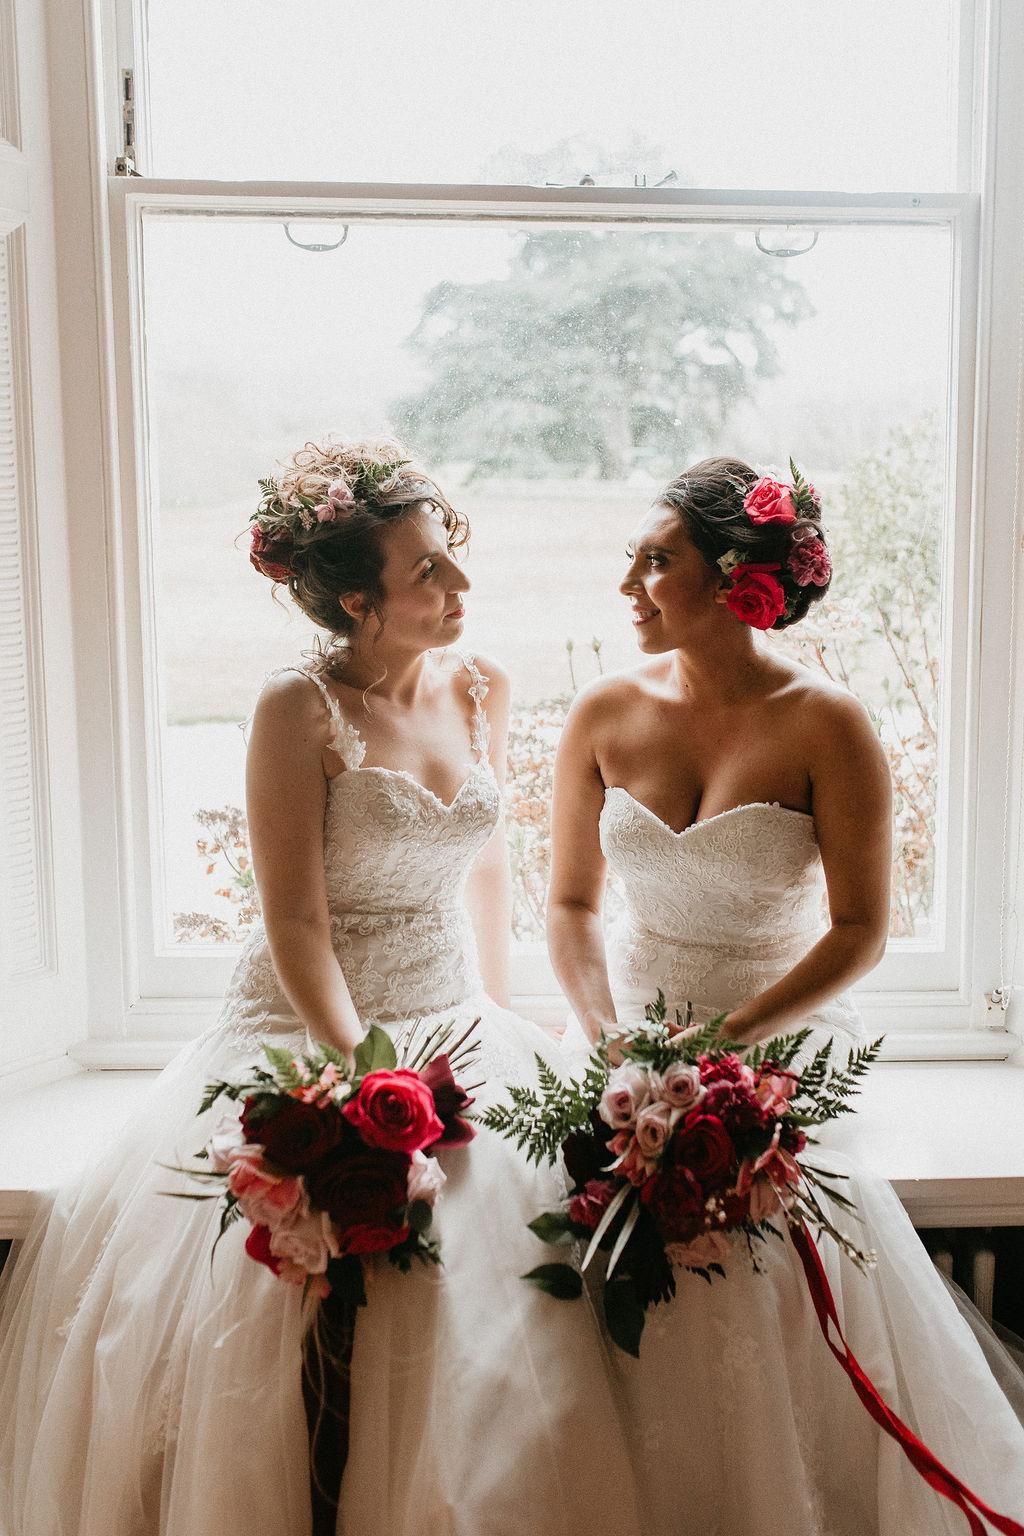 romantic woodland wedding - whimsical wedding- shakespeare wedding- unconventional wedding- same sex wedding photo- brides in windowsill